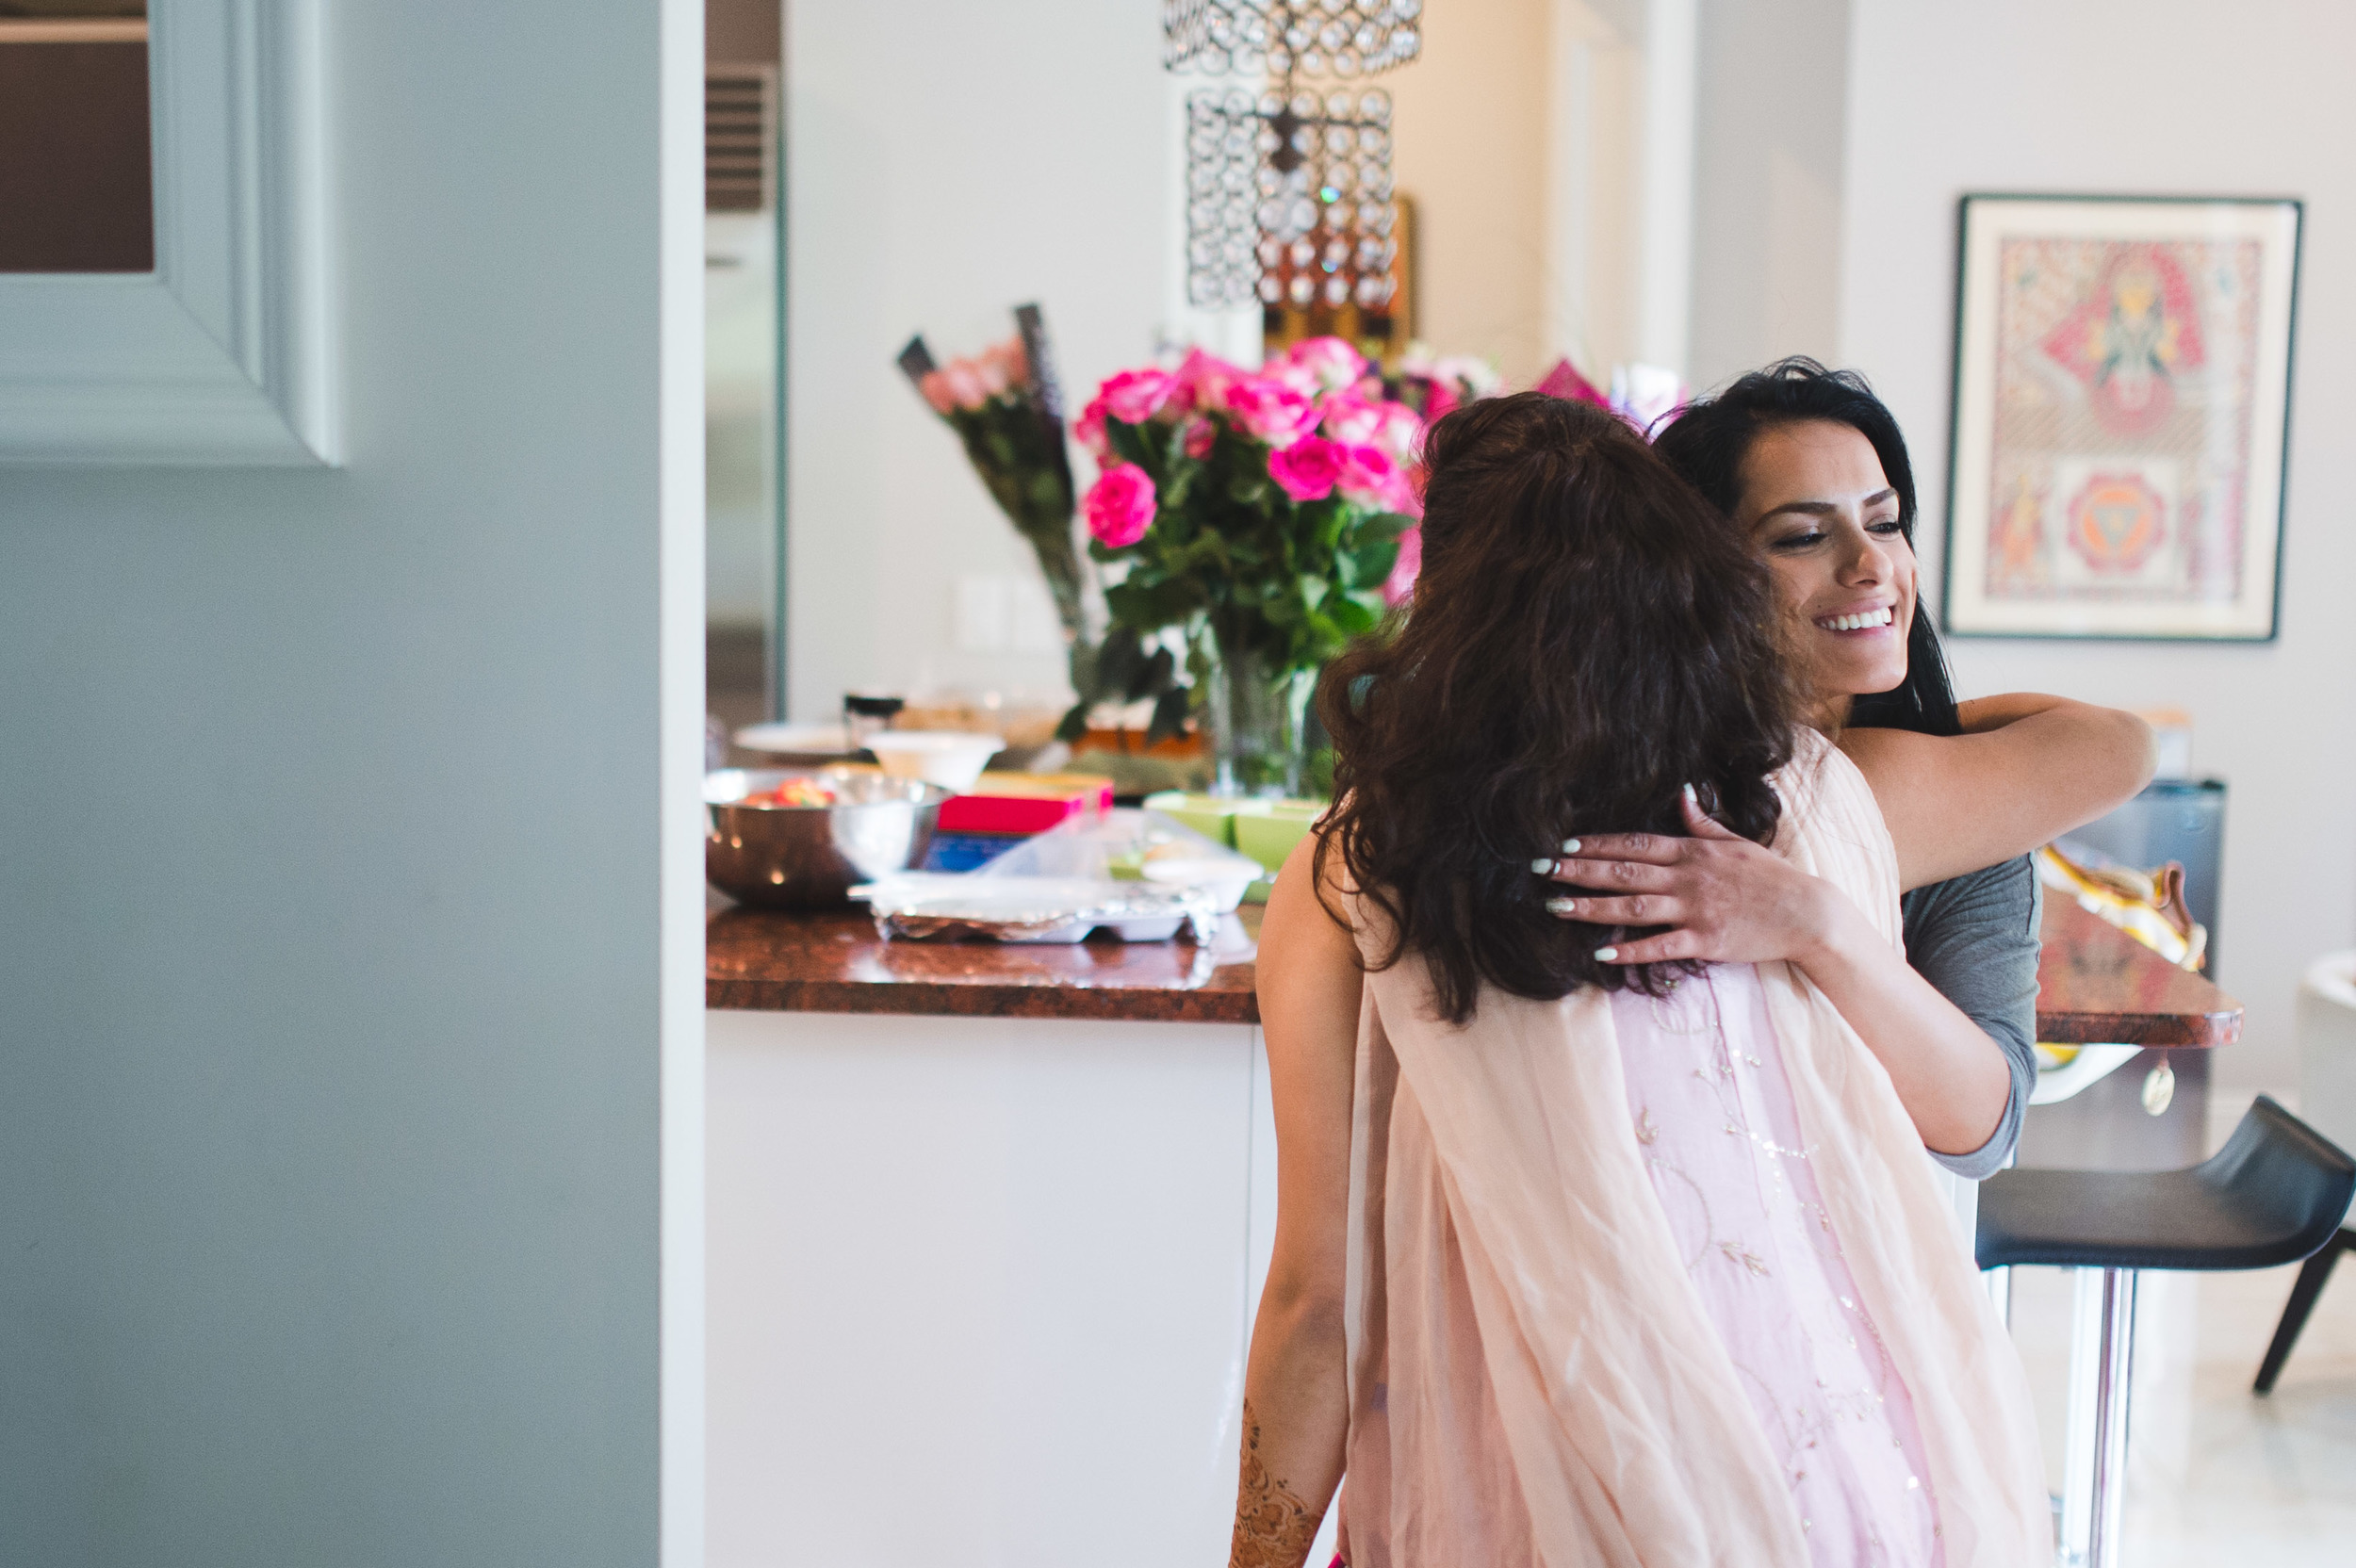 Indian Pre-wedding  at Arena Stage Washington DC by Mantas Kubilinskas-12.jpg